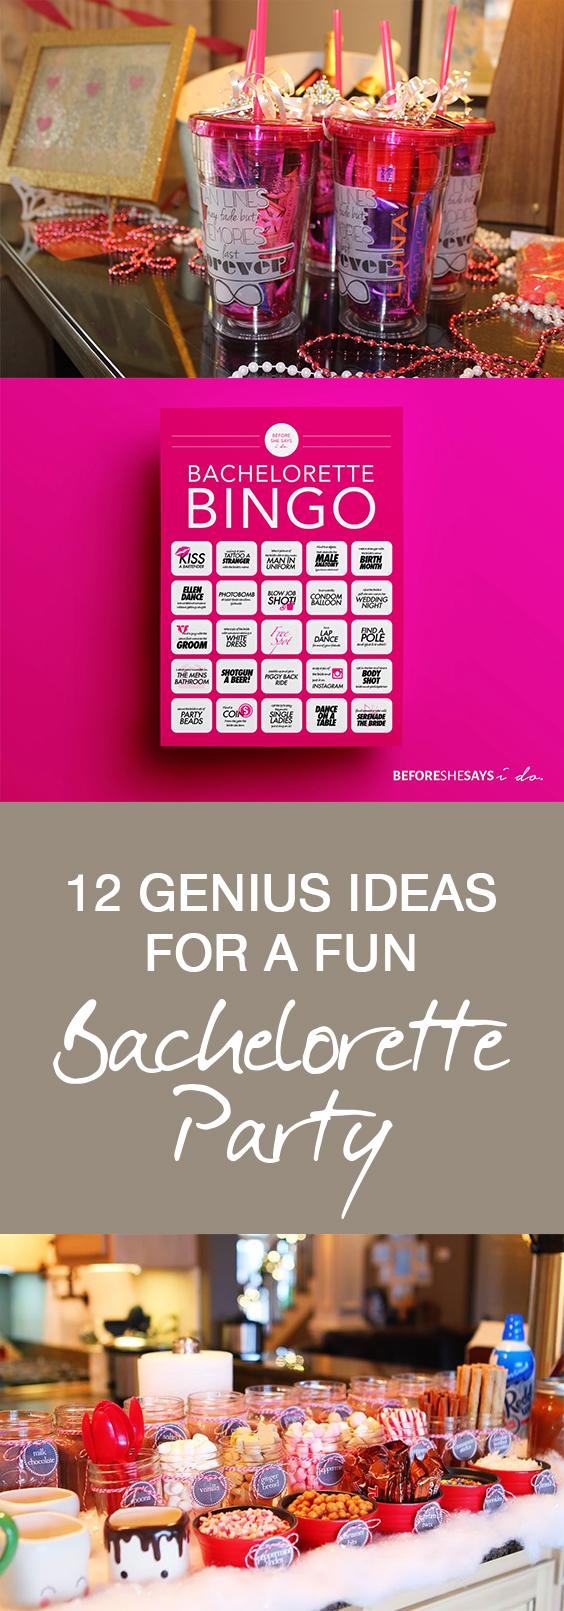 Bachelorette Ideas, Bachelorette Party, Bachelorette, Popular Pin, Wedding Party, Wedding Party Ideas, Wedding Party Hacks, Wedding Party Tricks